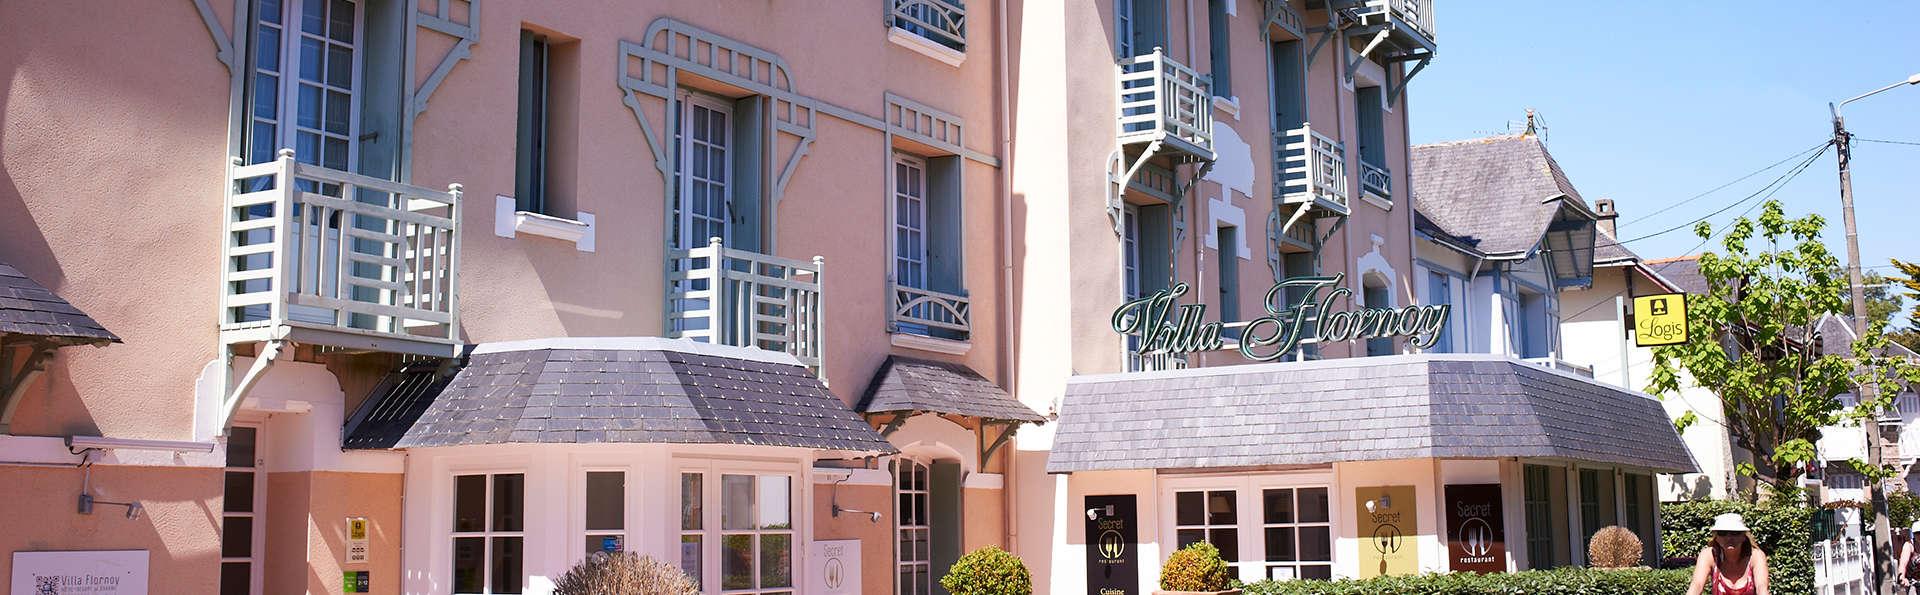 Villa Flornoy - edit_front.jpg